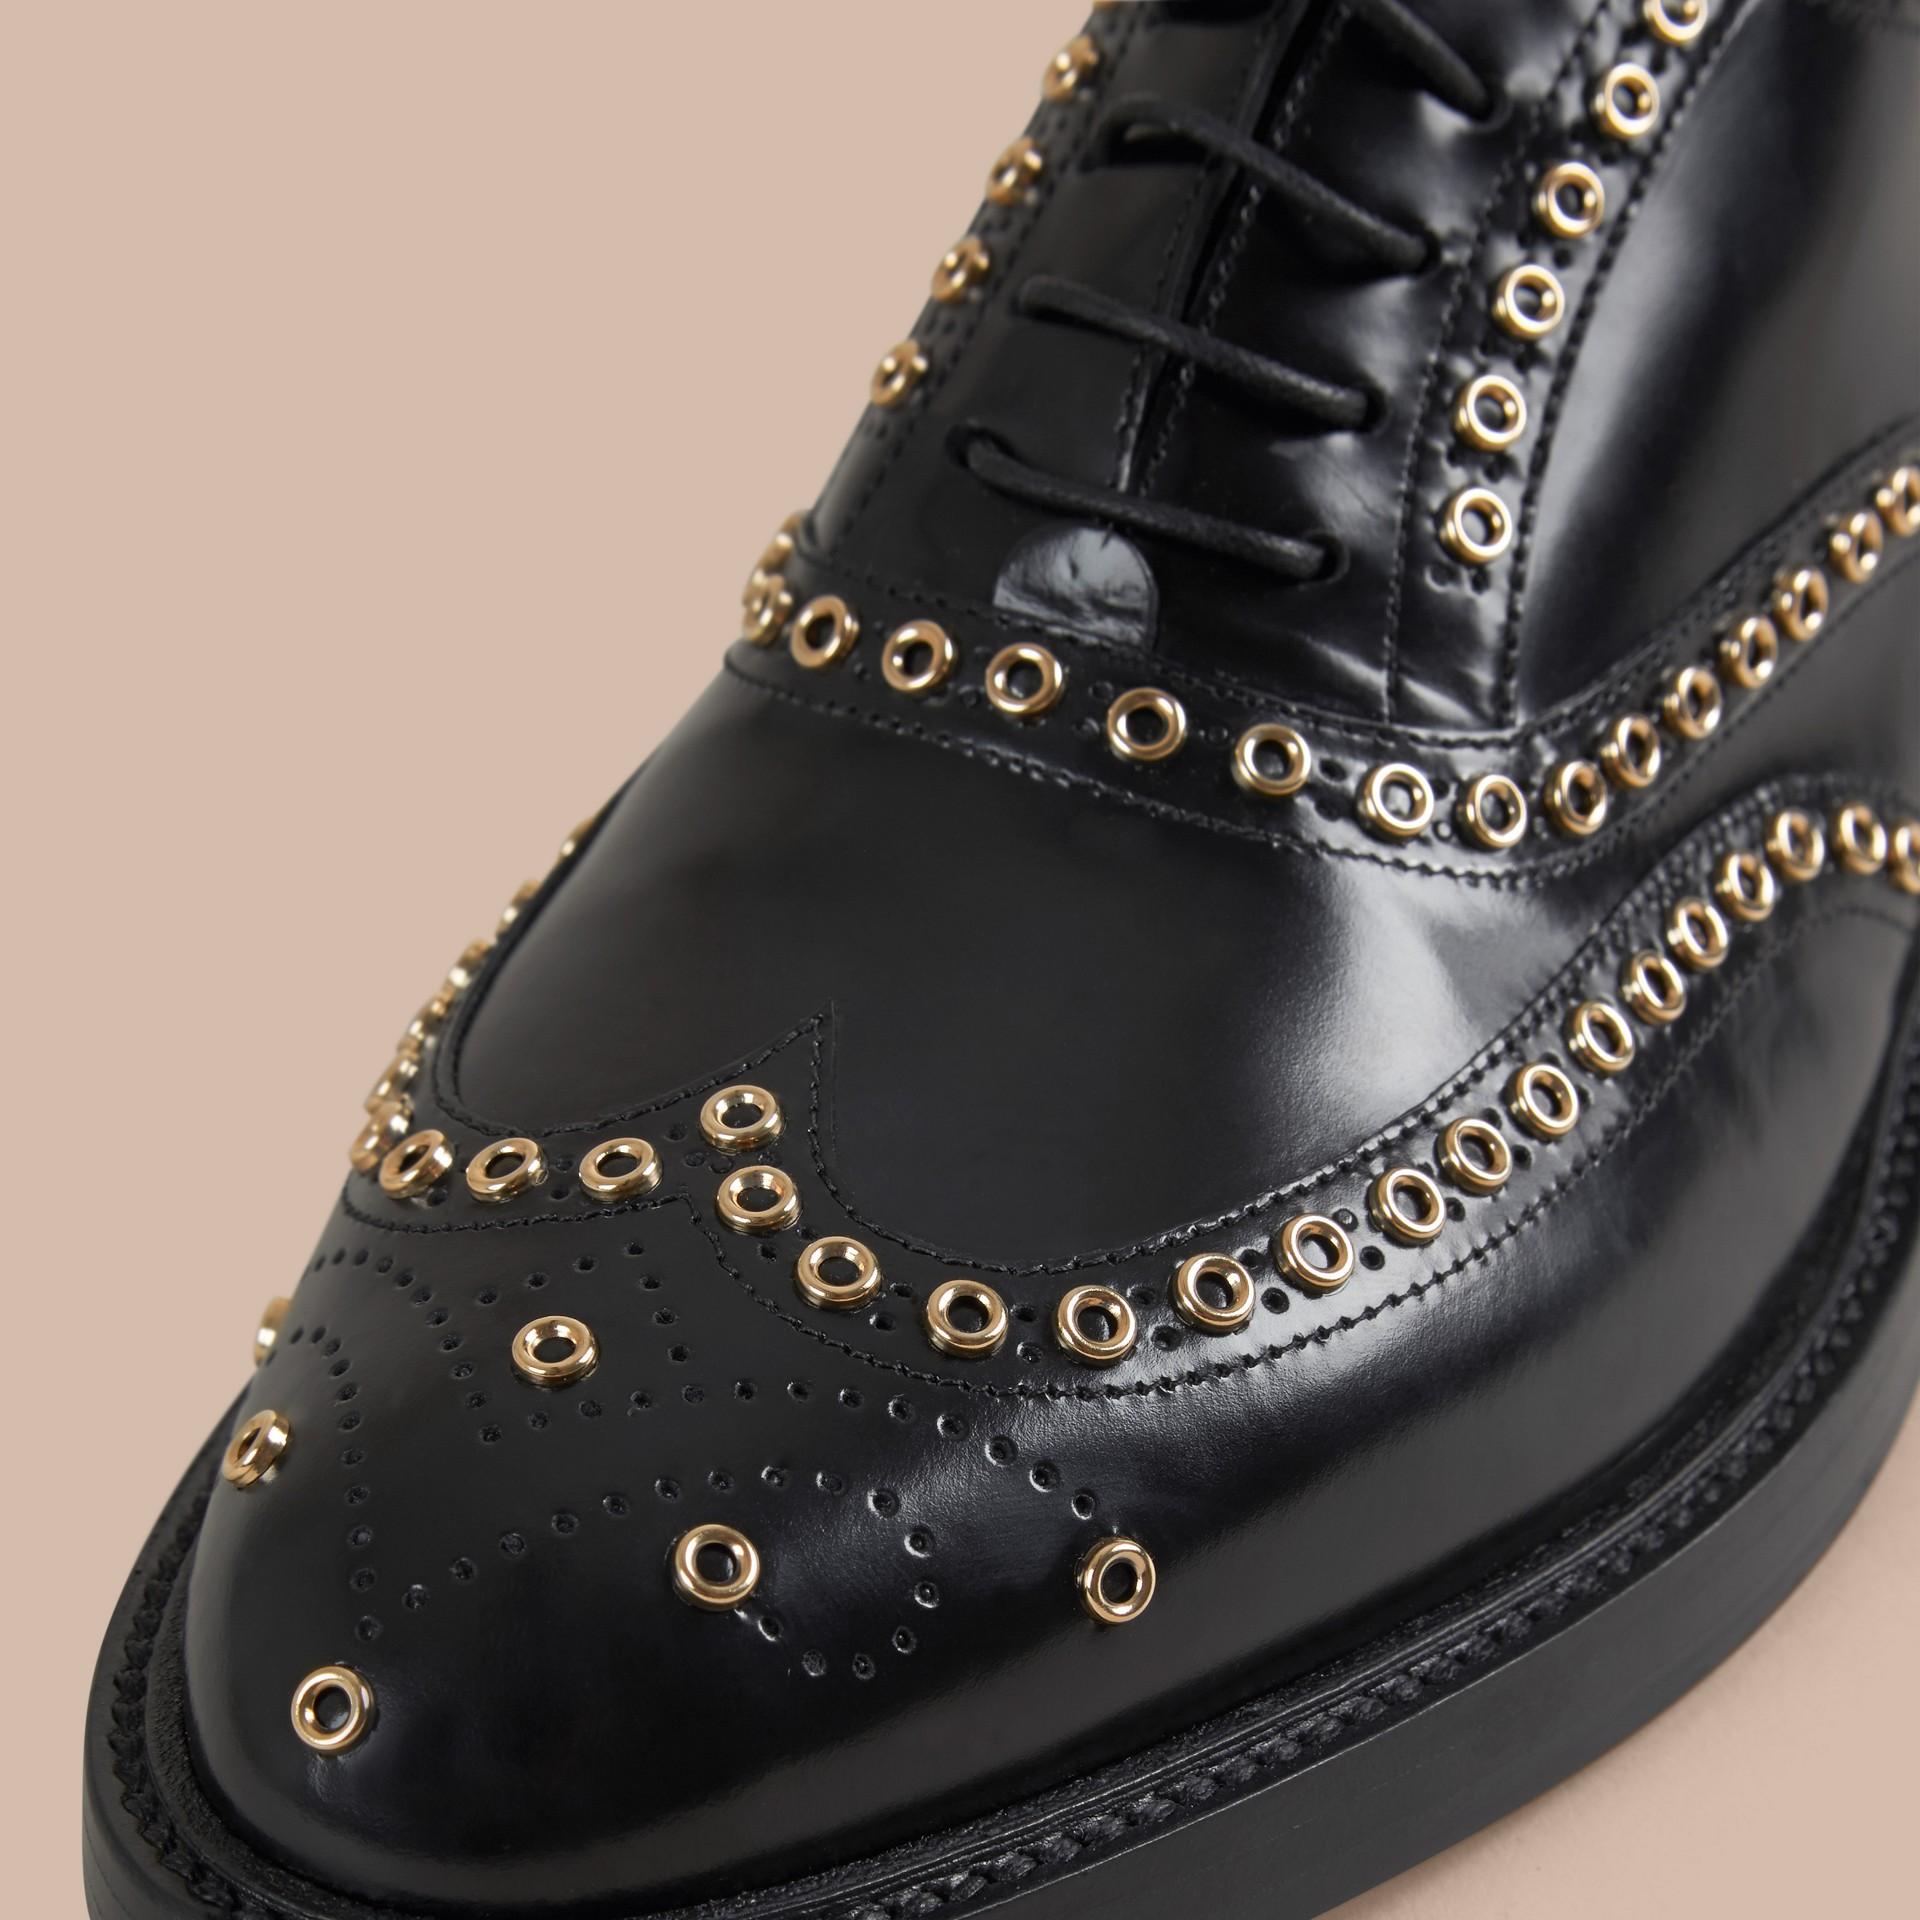 Black Online Exclusive Eyelet Detail Leather Wingtip Brogues - gallery image 2